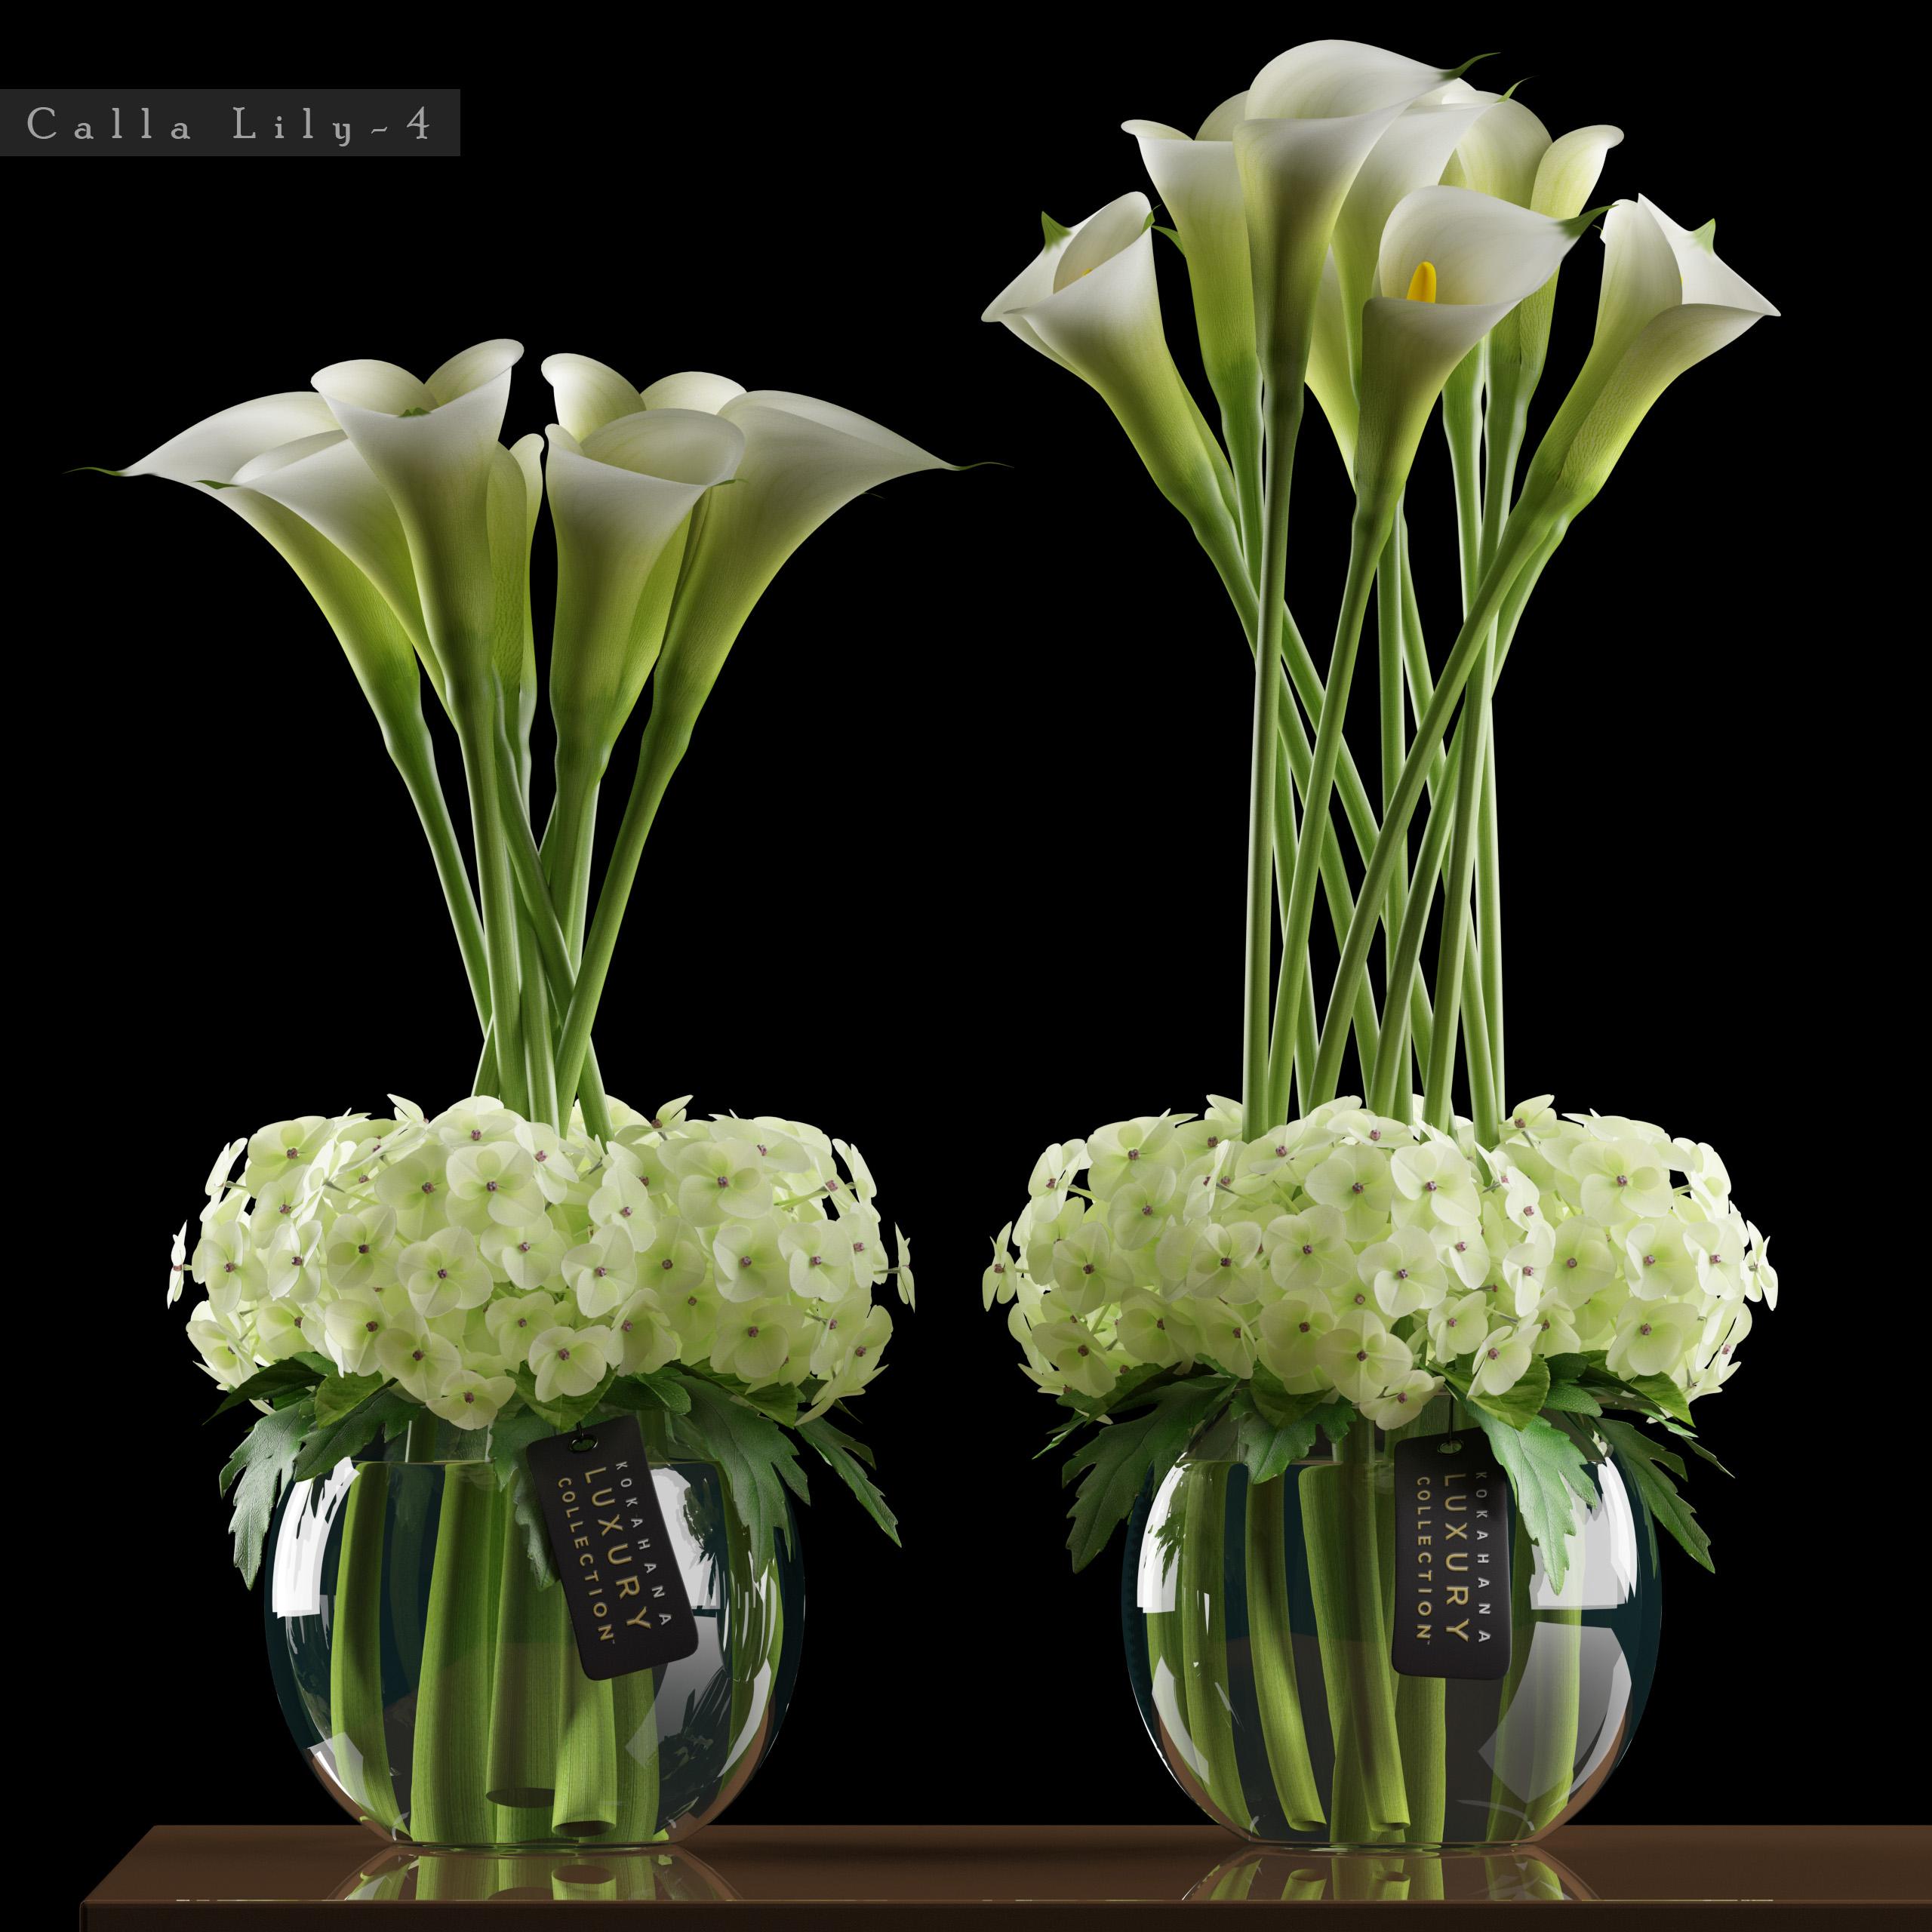 White Calla Lily Flowers 3d Model Turbosquid 1177234